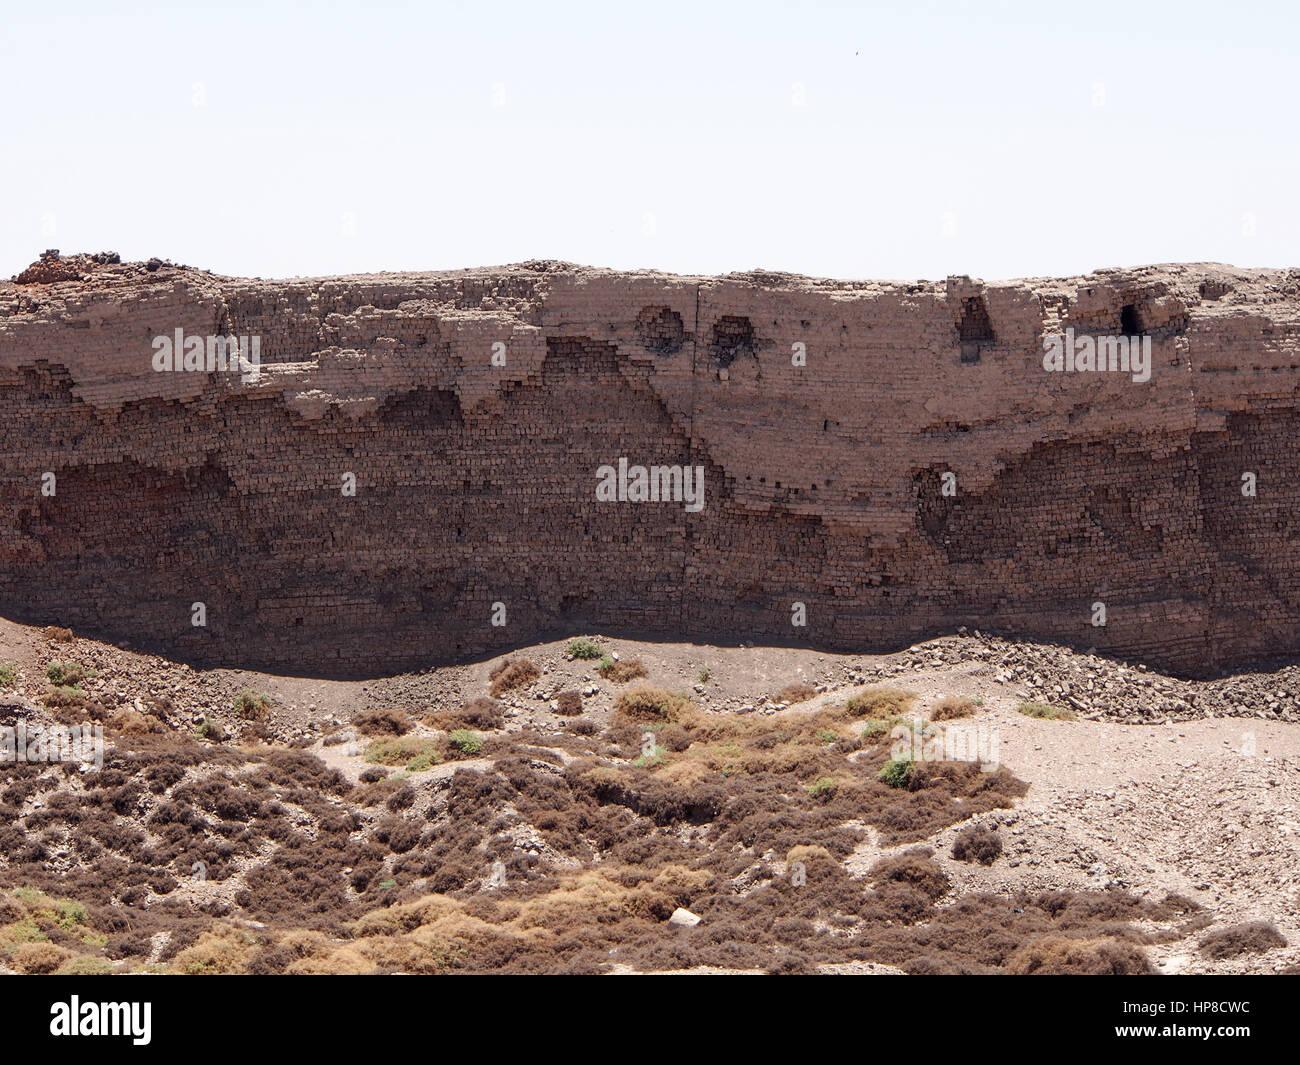 The mud brick enclosed wall surrounding Dendera Temple, Egypt - Stock Image